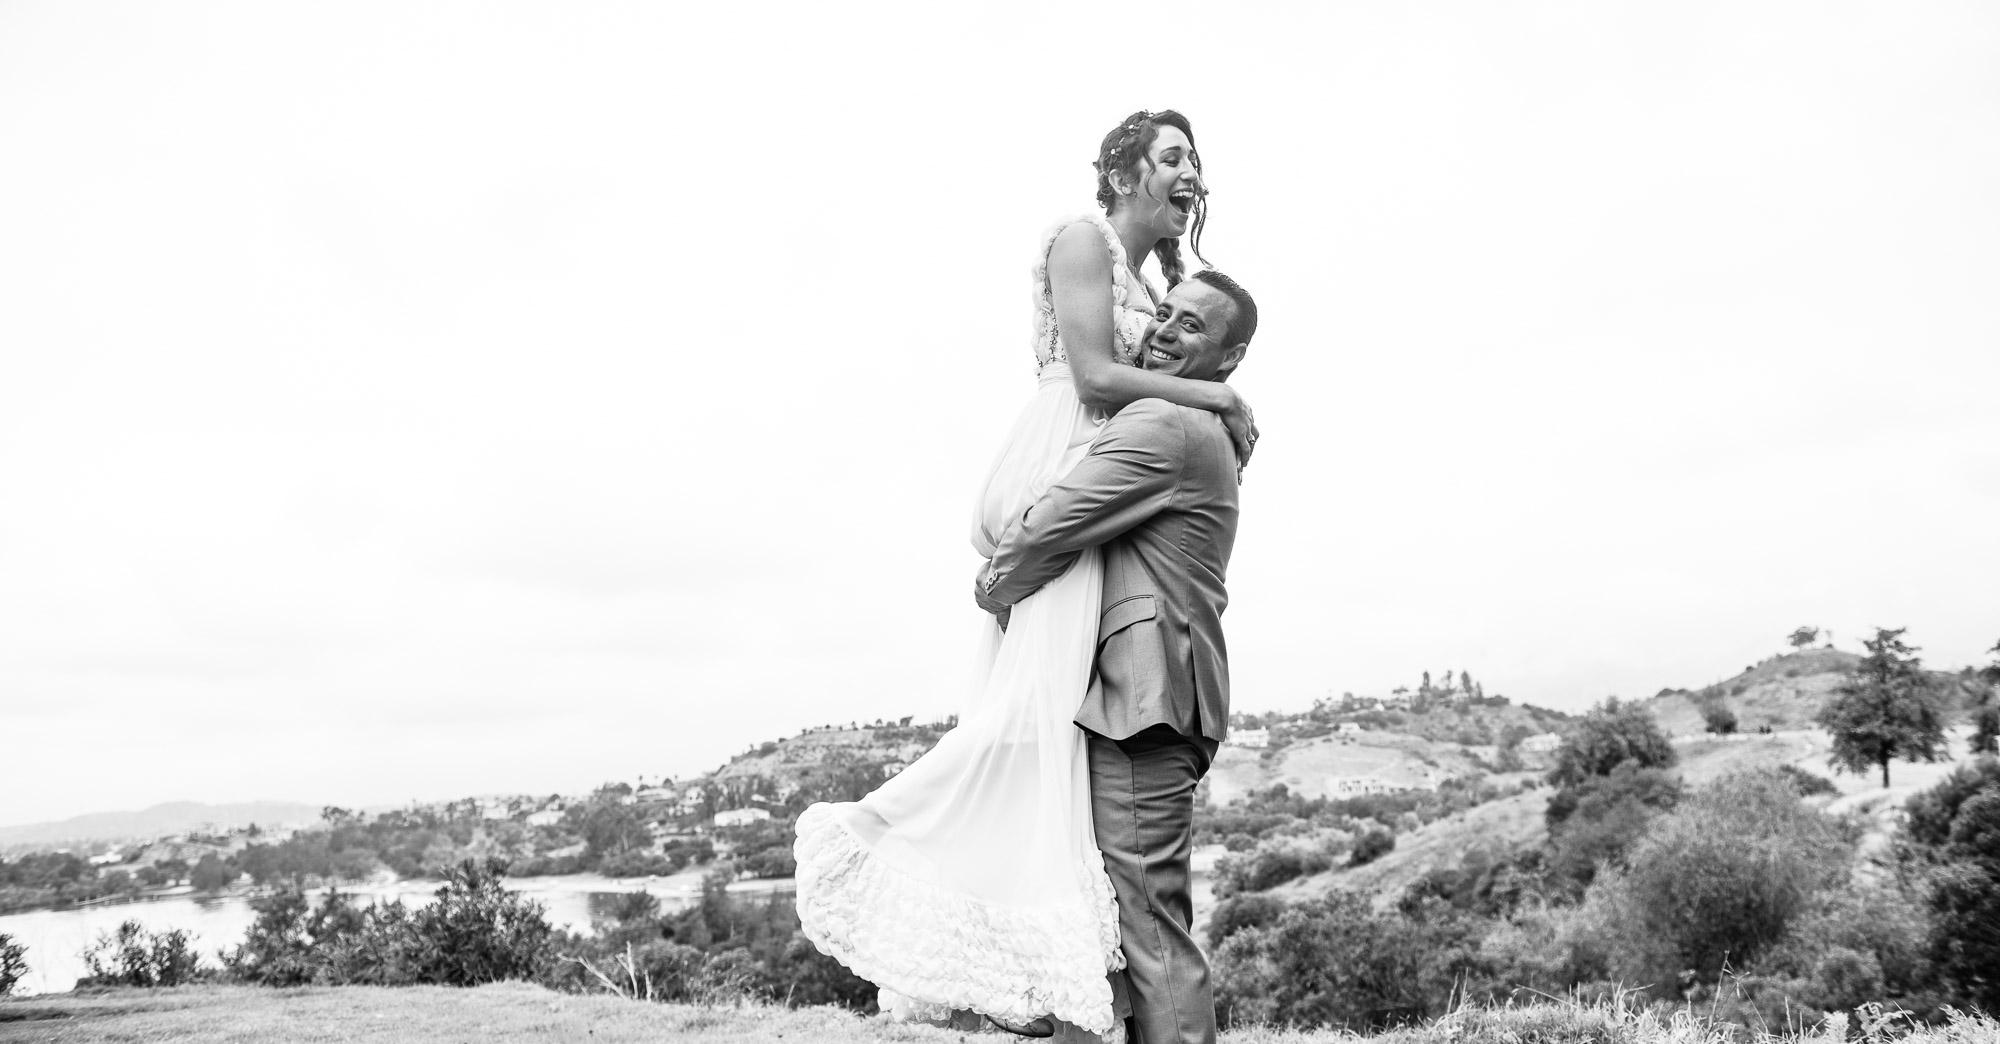 Nichole & Andrew's Los Angeles DIY Wedding featured slider image